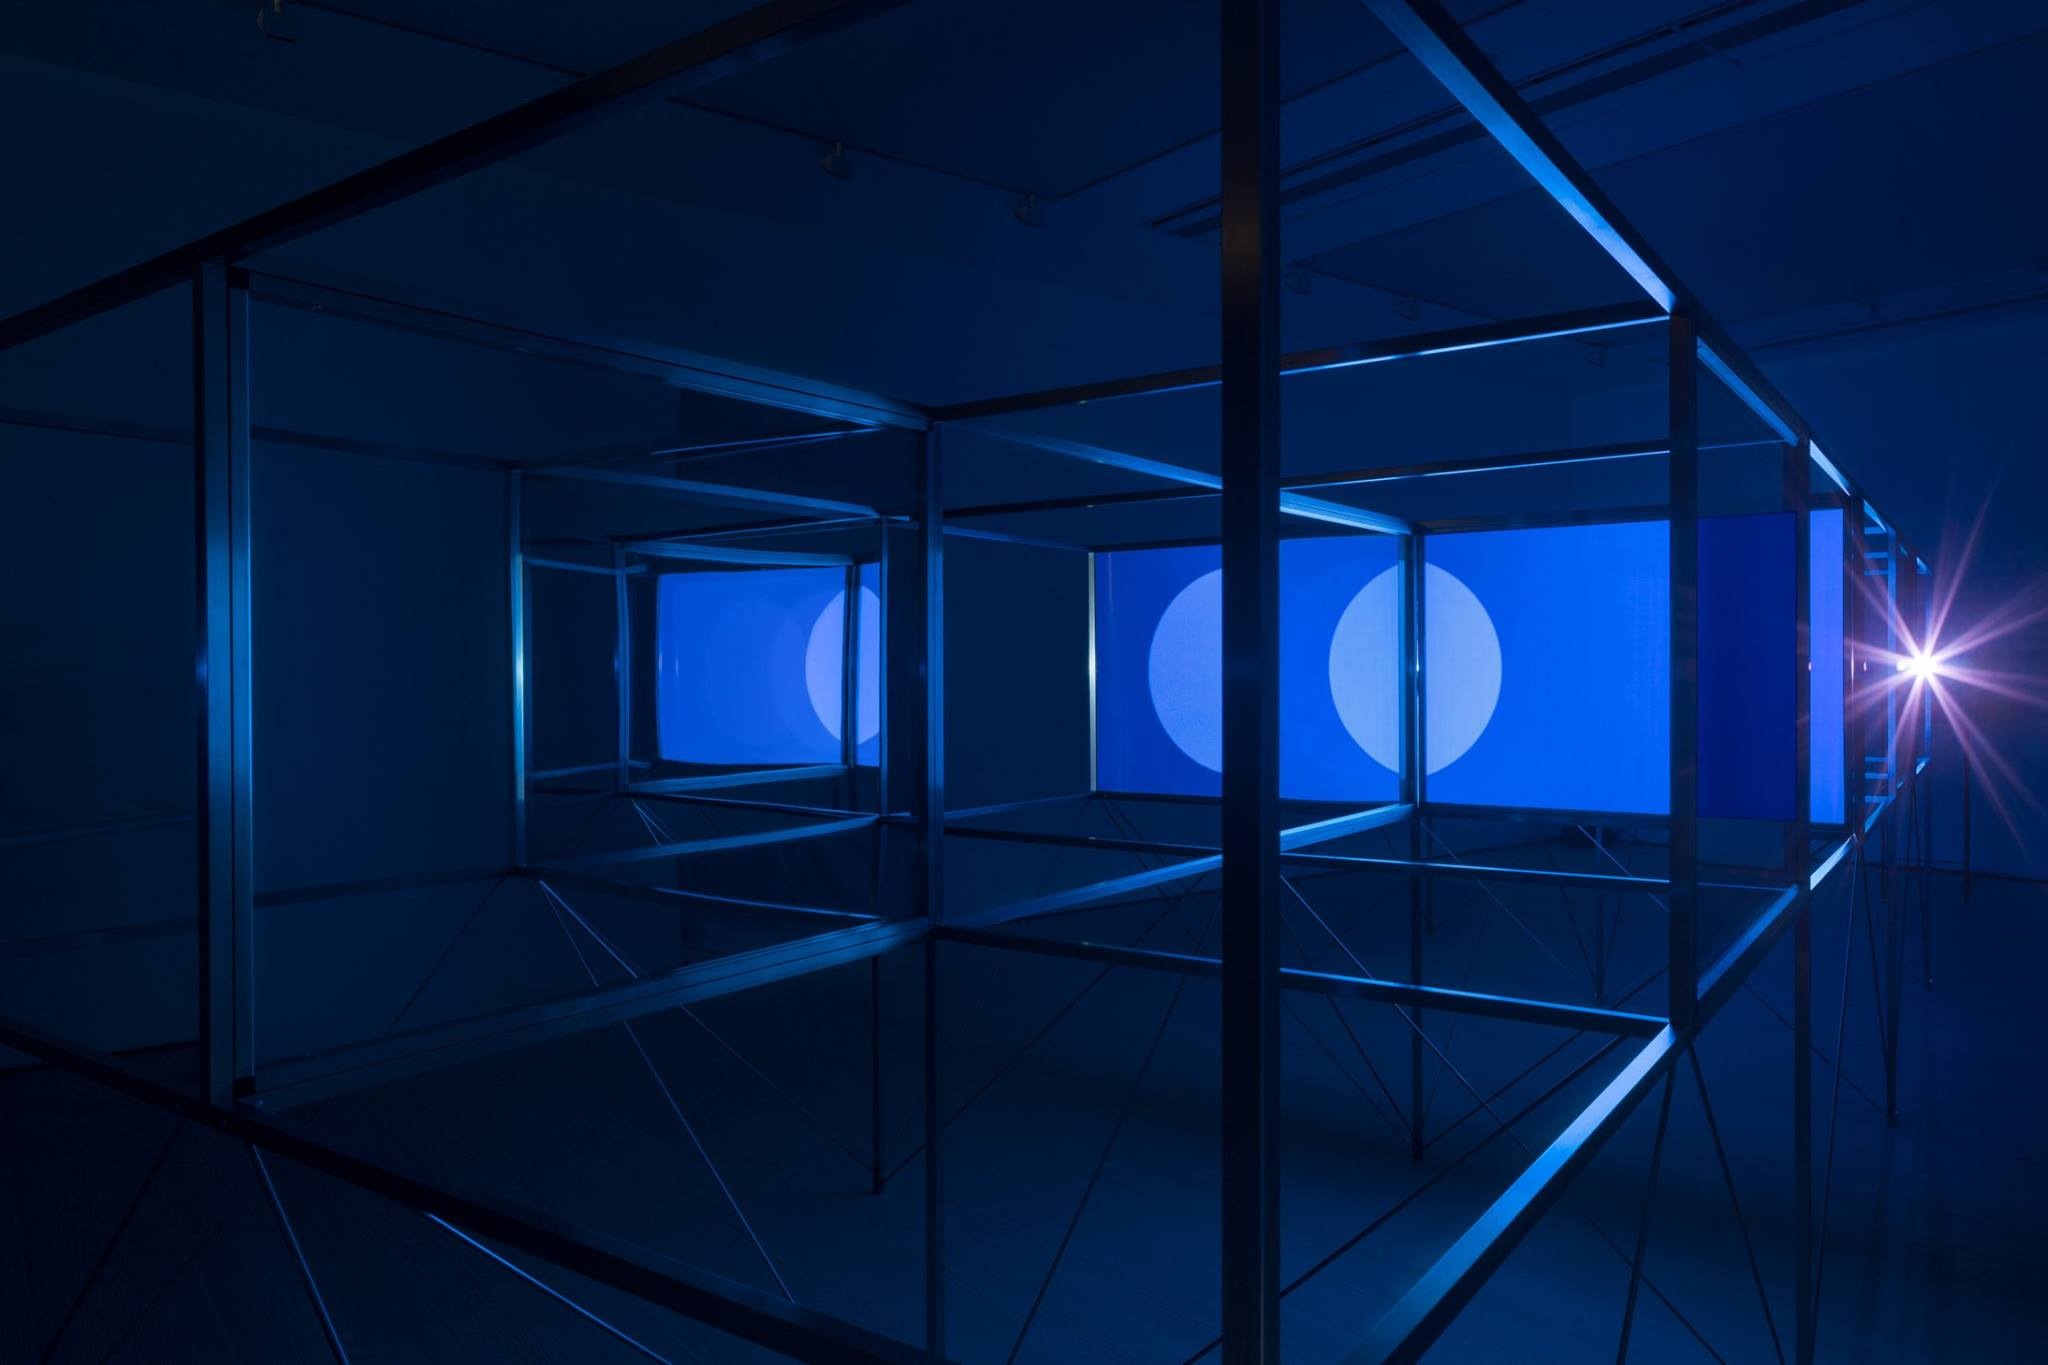 Continuum-Kite-Saatchi-04.jpg